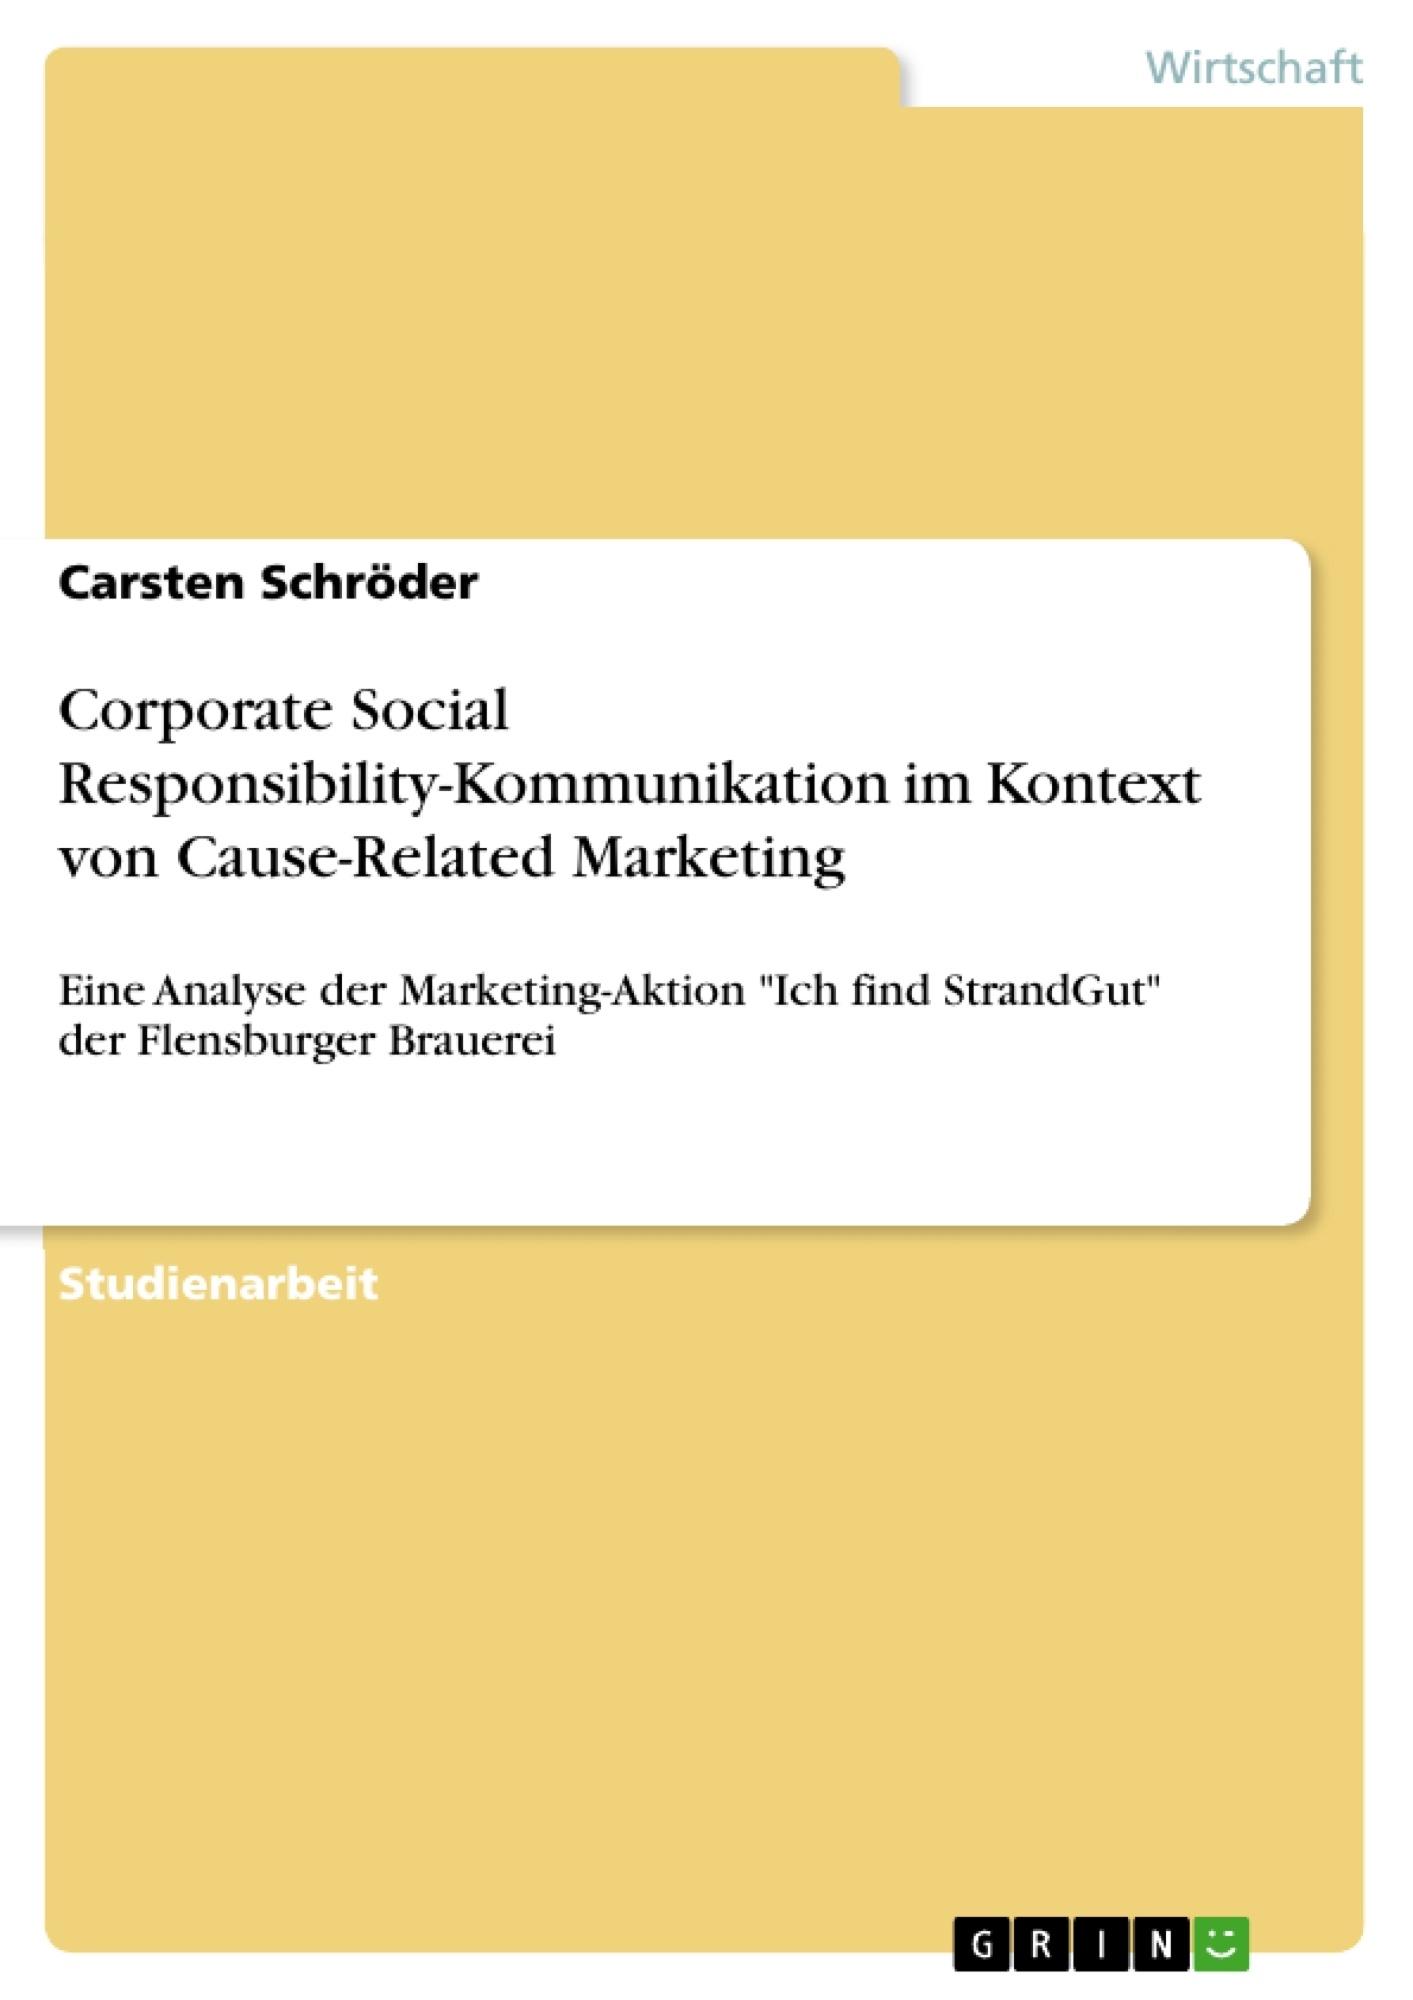 Titel: Corporate Social Responsibility-Kommunikation im Kontext von Cause-Related Marketing